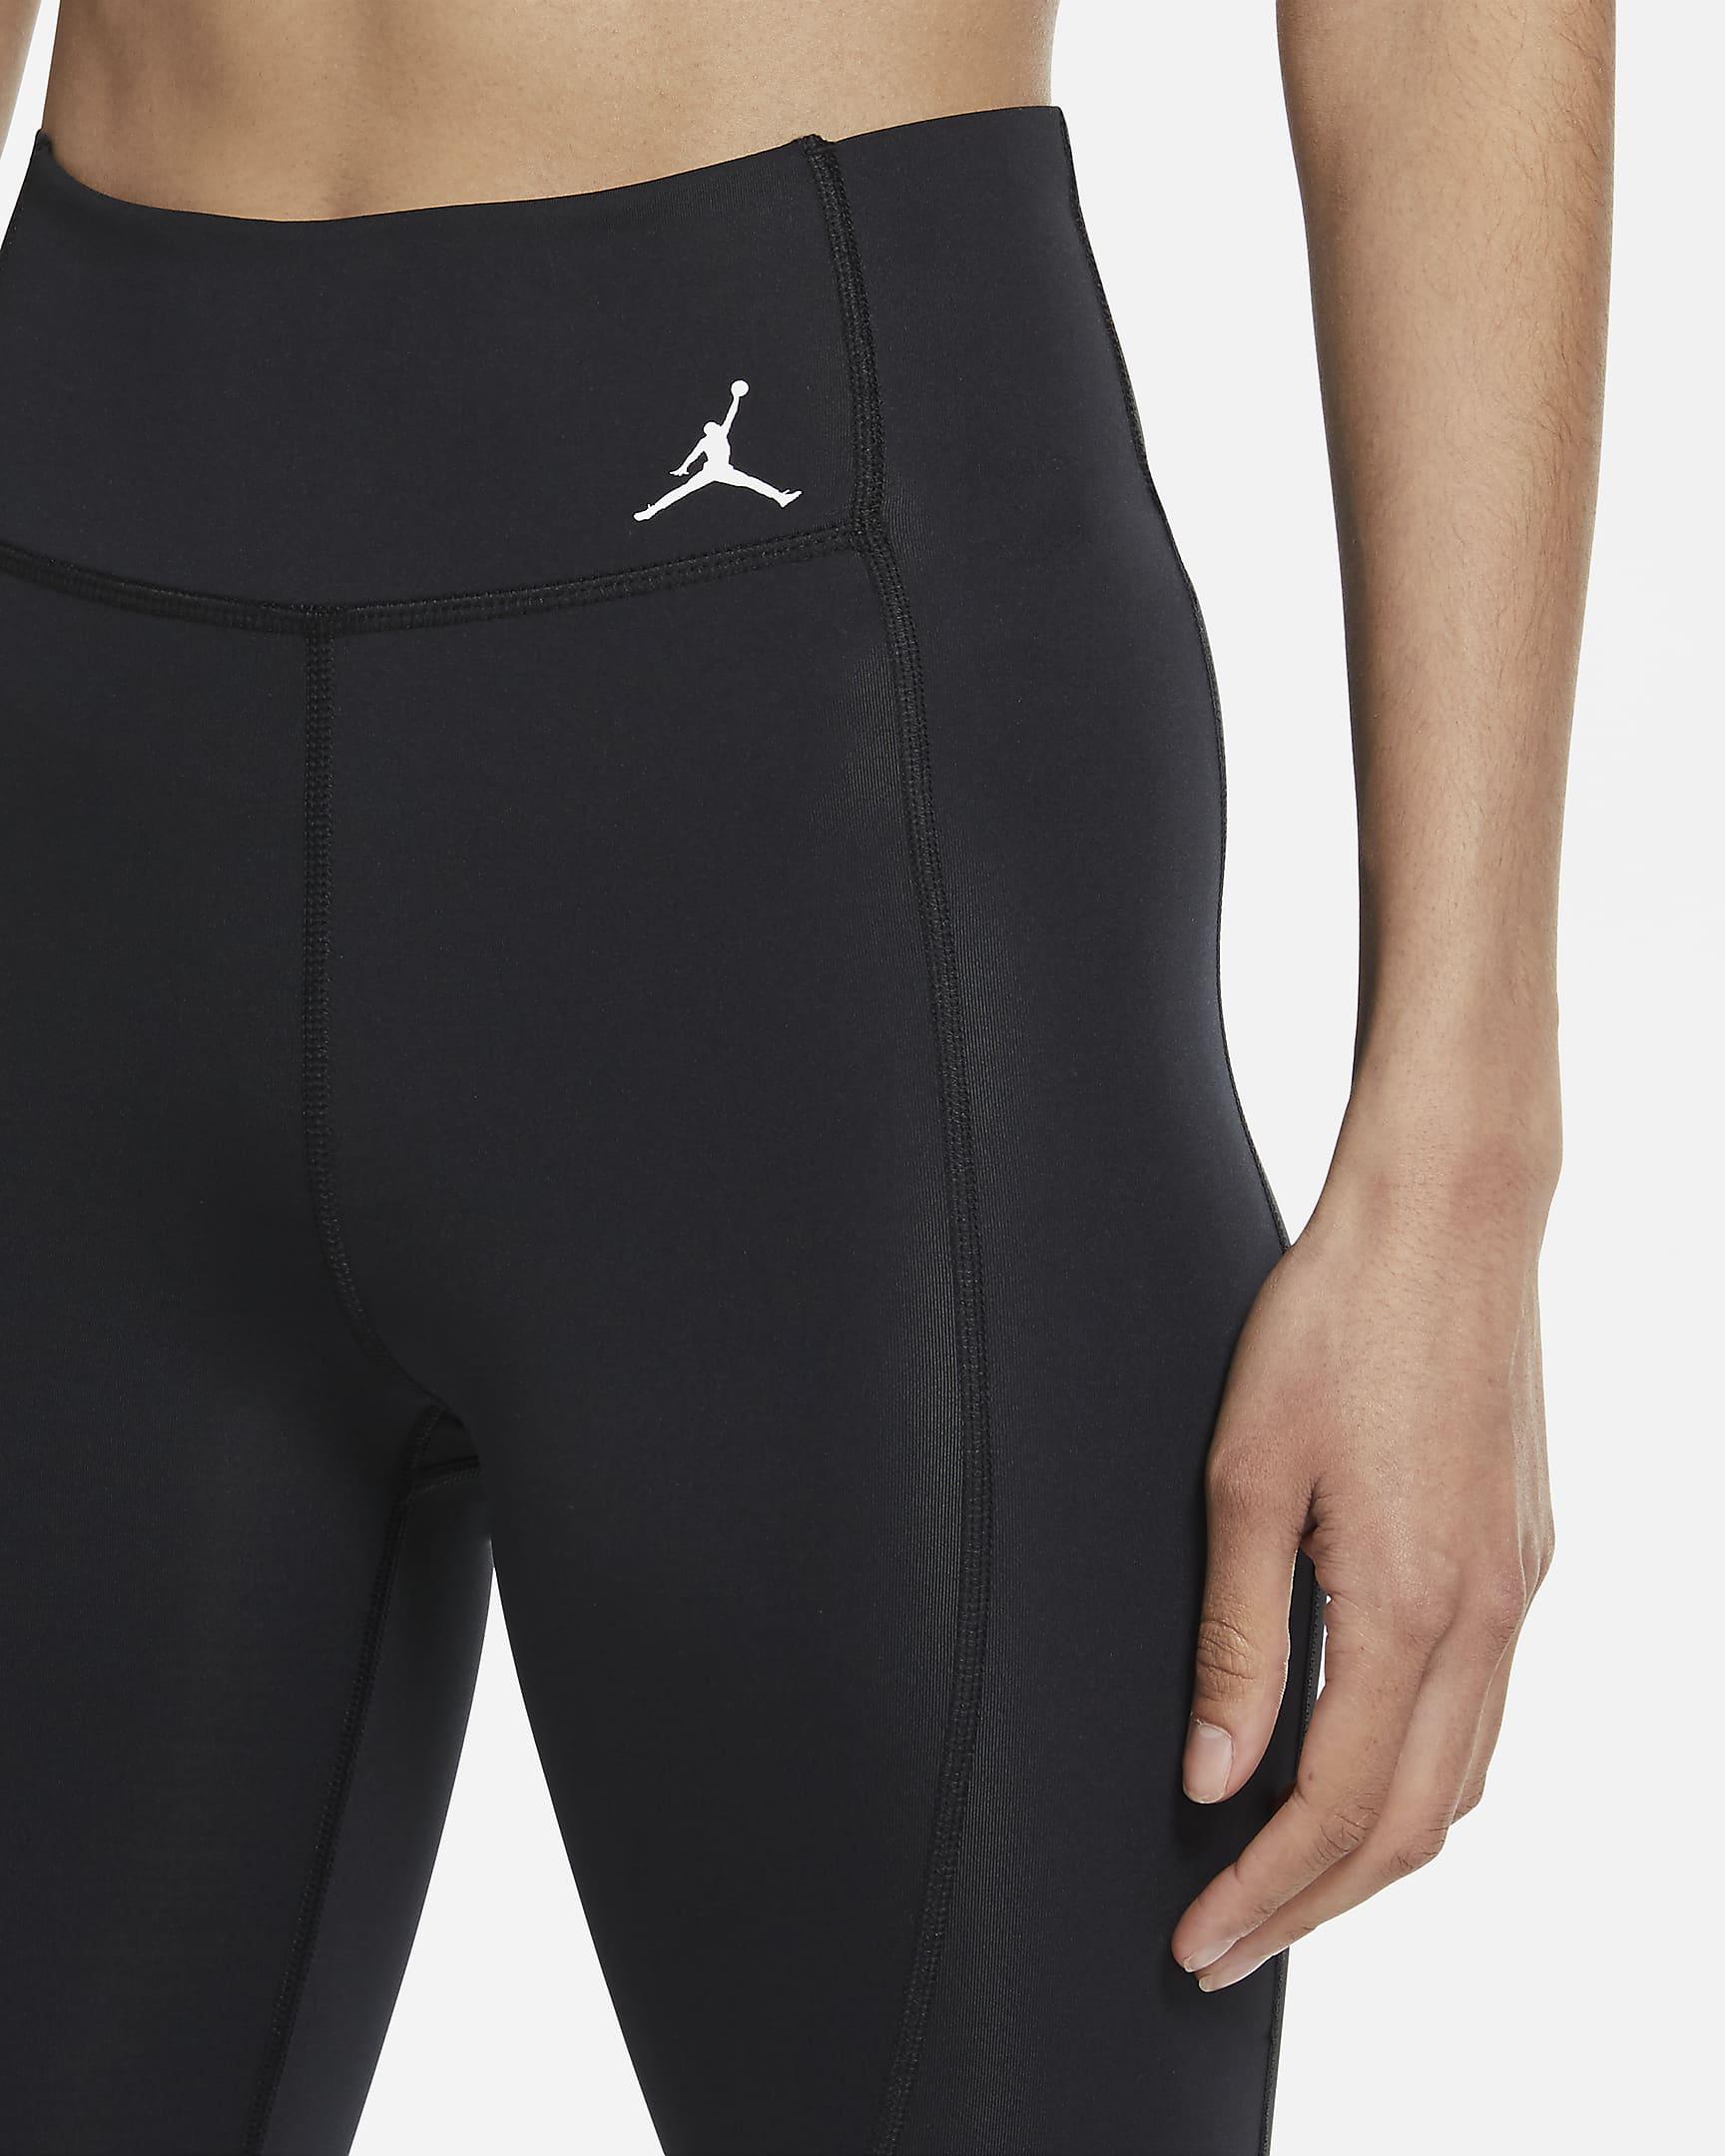 jordan-essentials-womens-mid-rise-7-8-leggings-N3lDkx-1.png